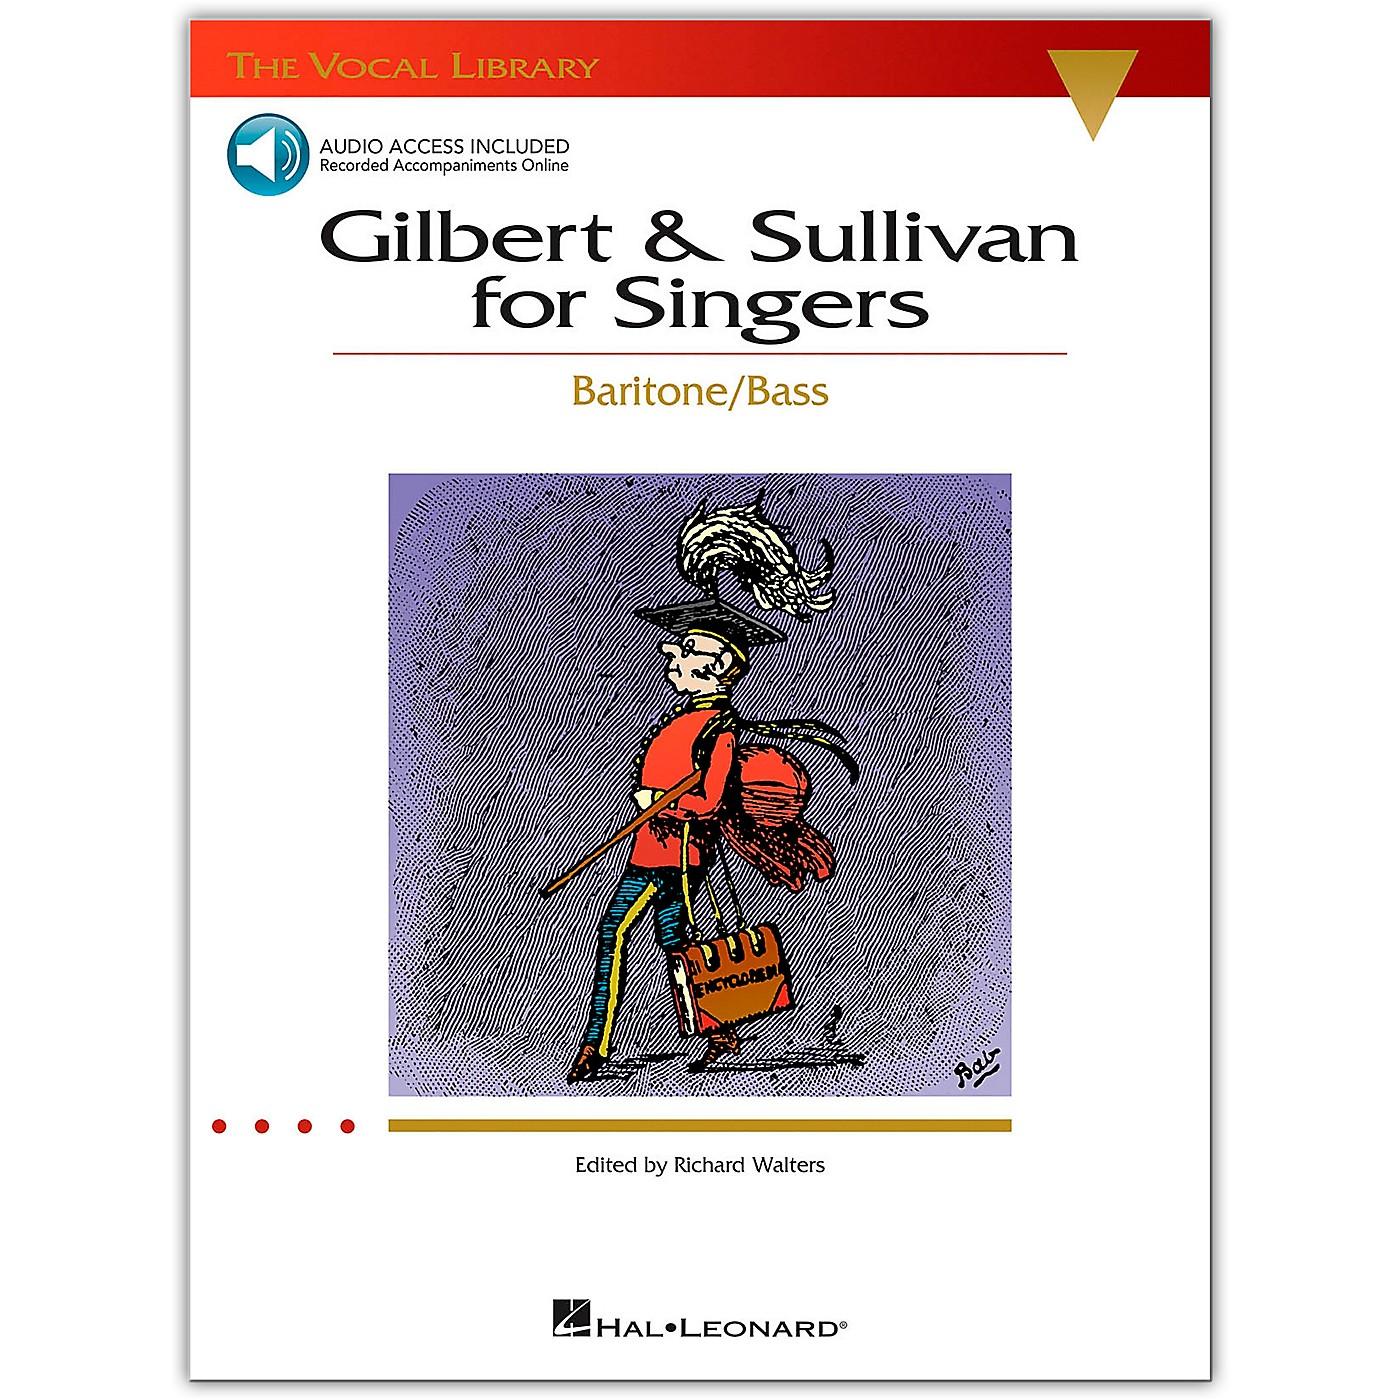 Hal Leonard The Vocal Library Series: Gilbert & Sullivan for Singers - Baritone/Bass (Book/Online Audio) thumbnail